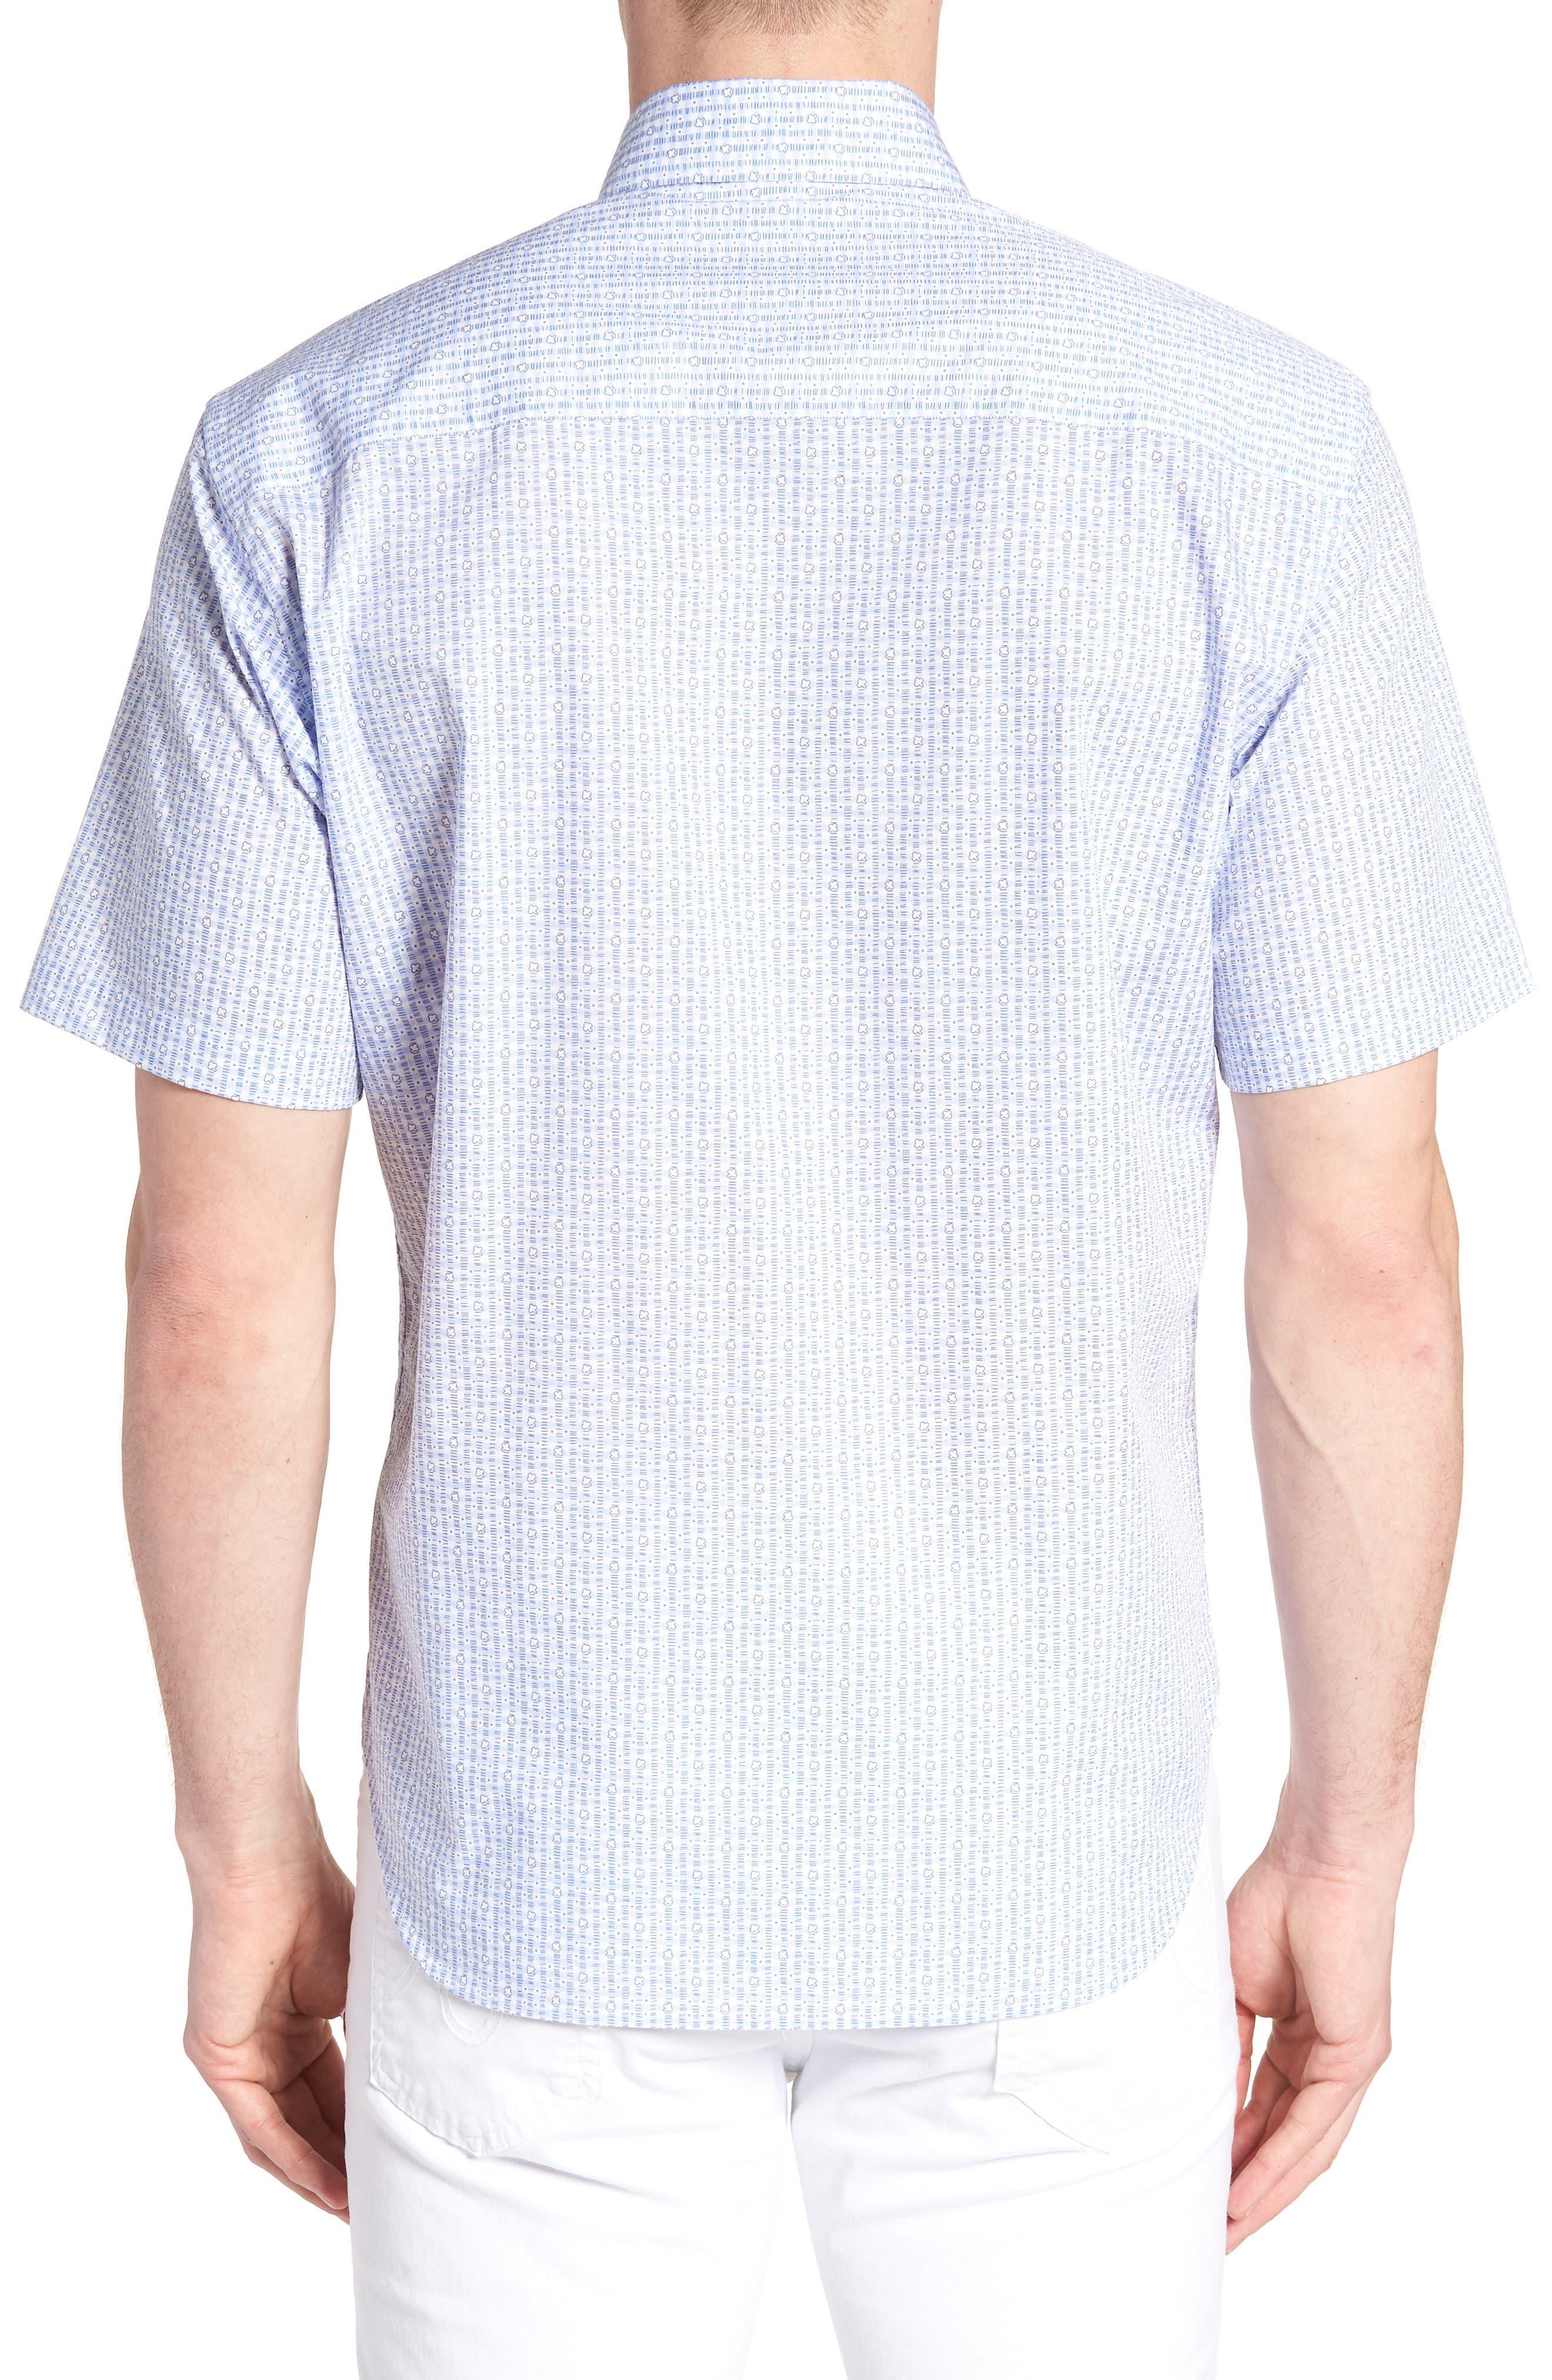 Arnie Regular Fit Sport Shirt,                             Alternate thumbnail 2, color,                             450